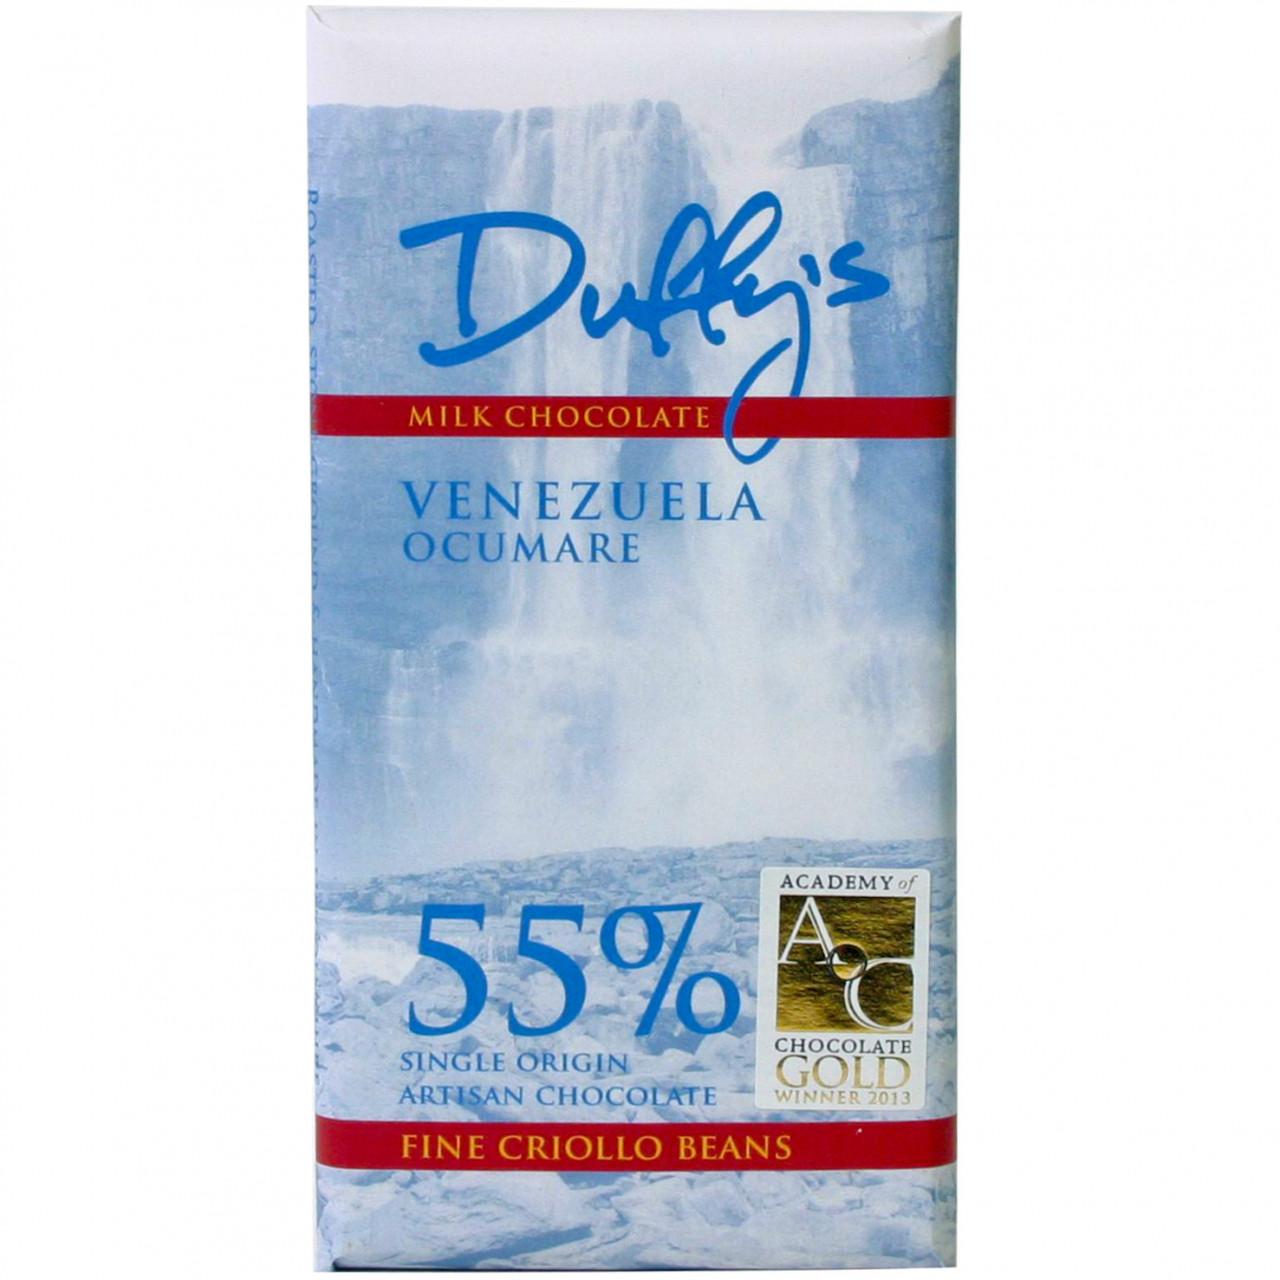 Venezuela Ocumare 55%, Duffy's Chocolate, 55% Milchschokolade, Schokolade aus Venezuela, milkchocolate, chocolat au lait, single origin Schokolade, criollo Schokolade,